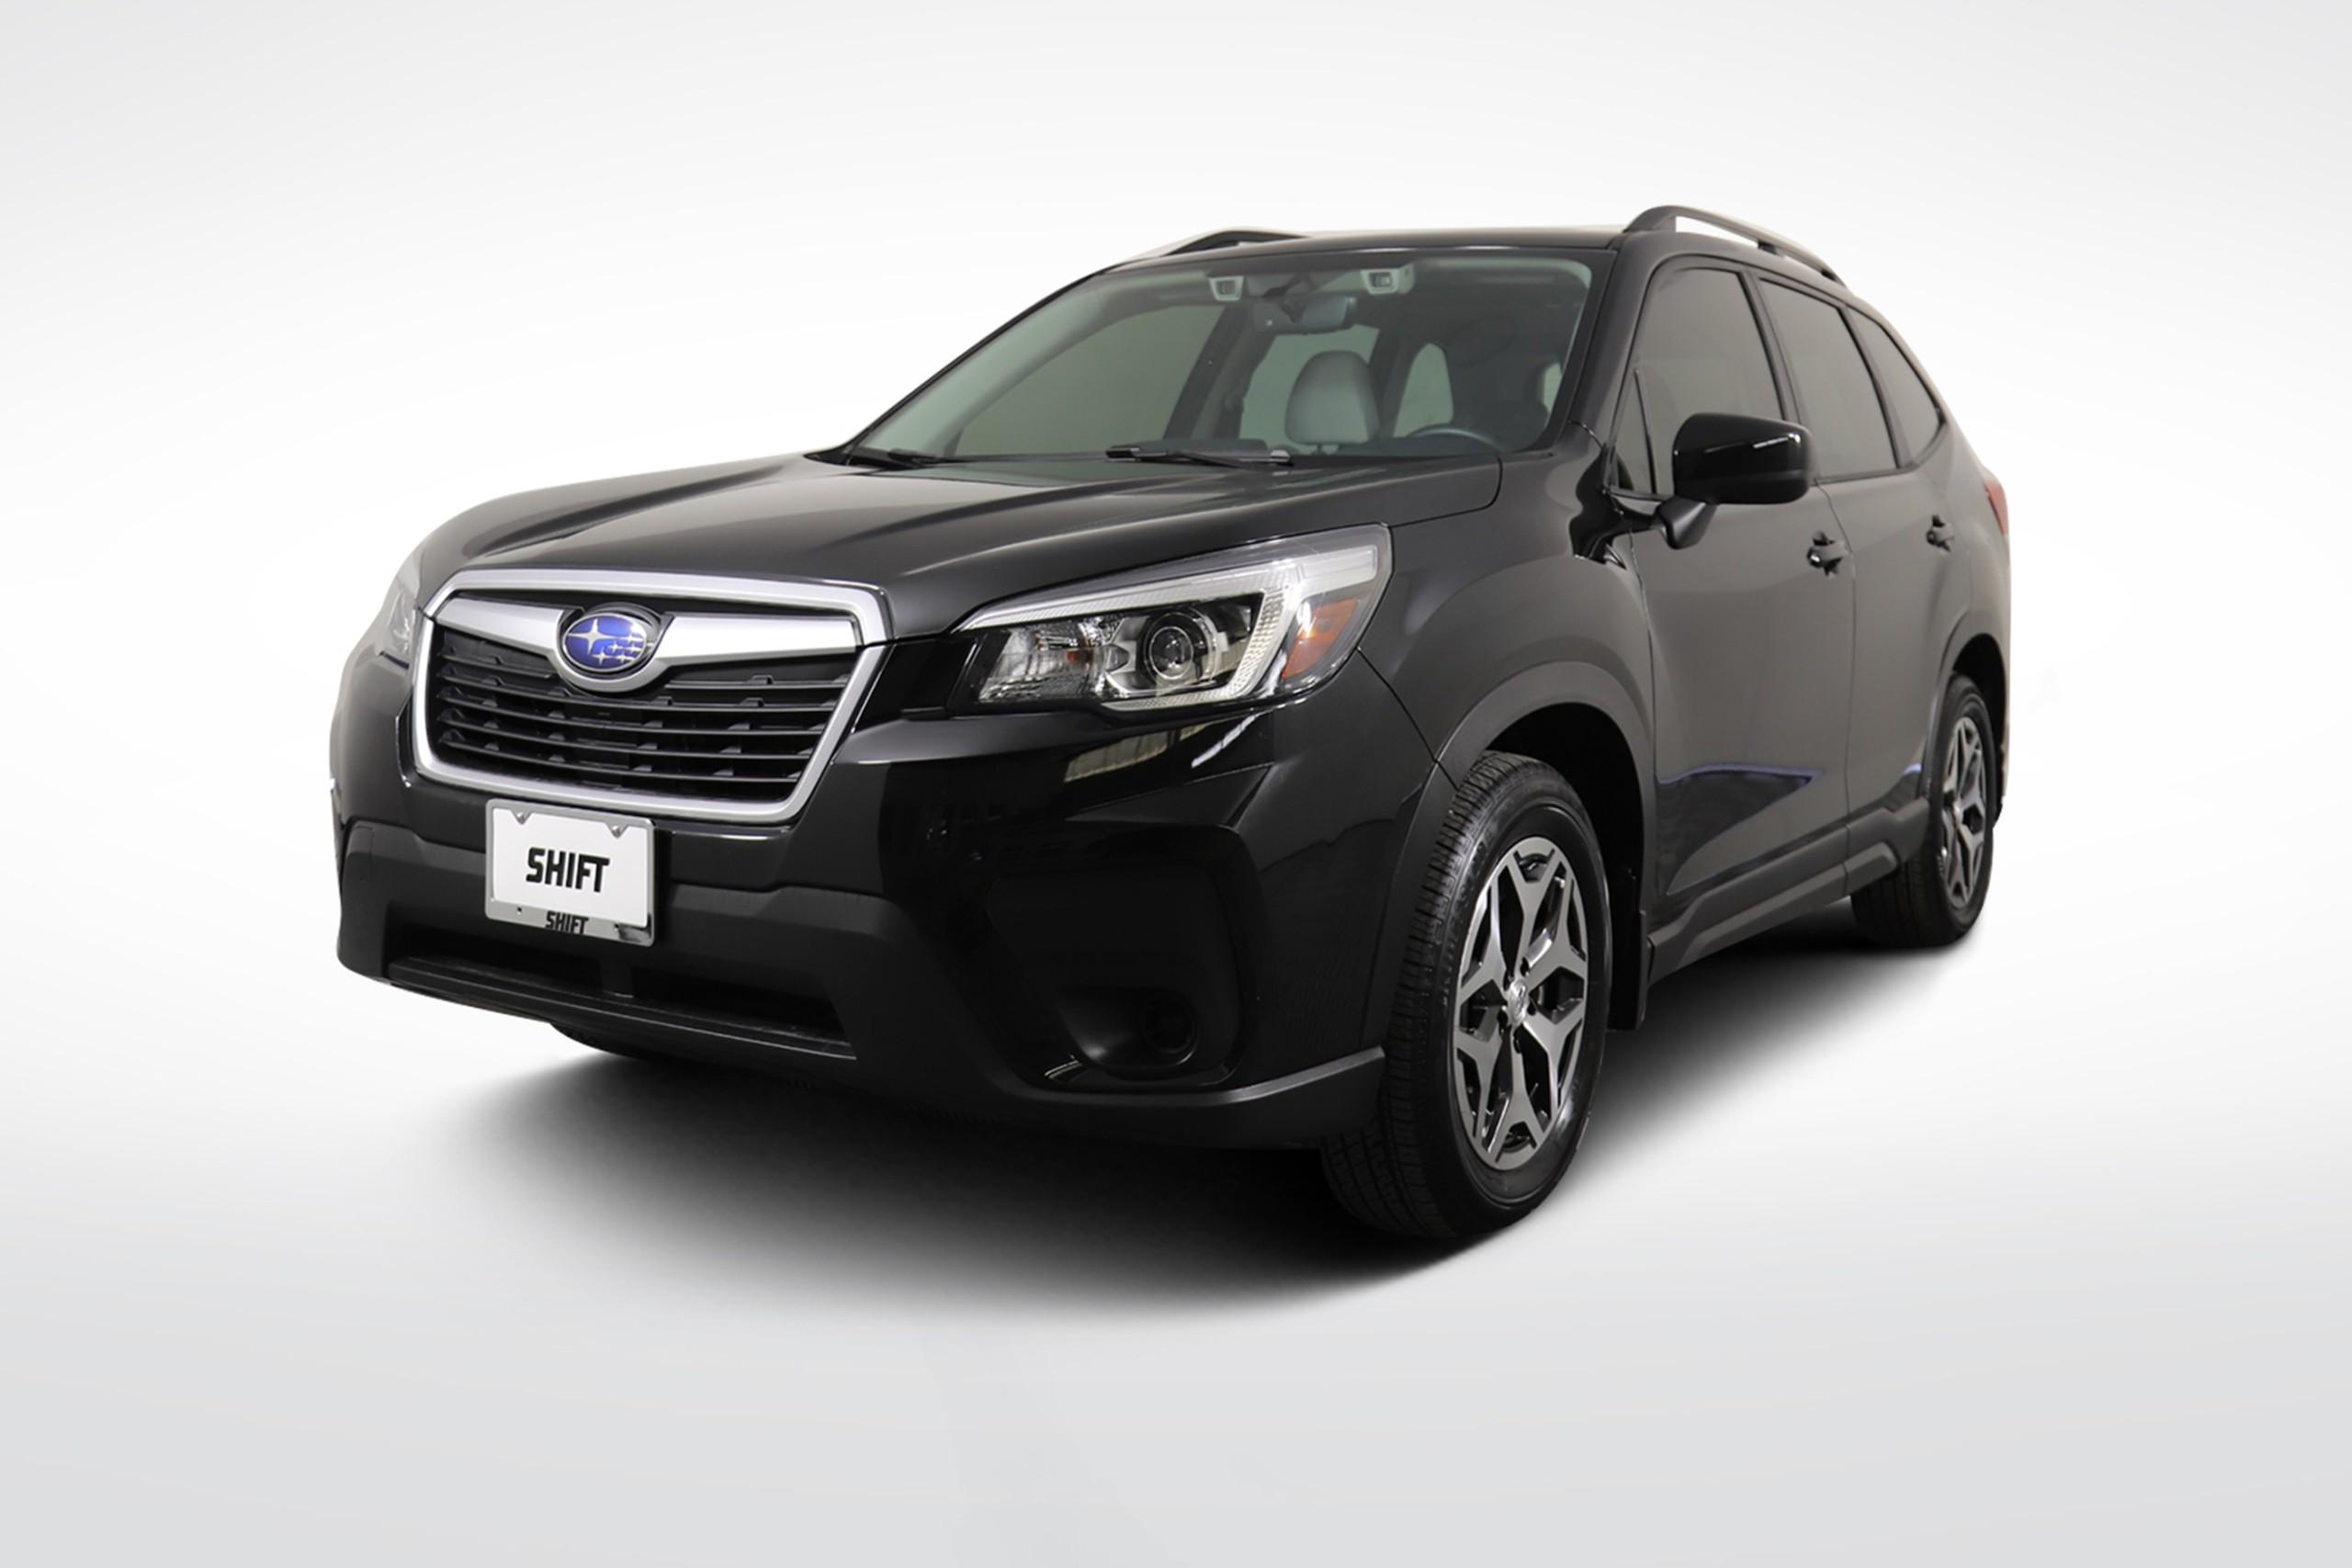 2020 Subaru Forester Premium (from $30,950)